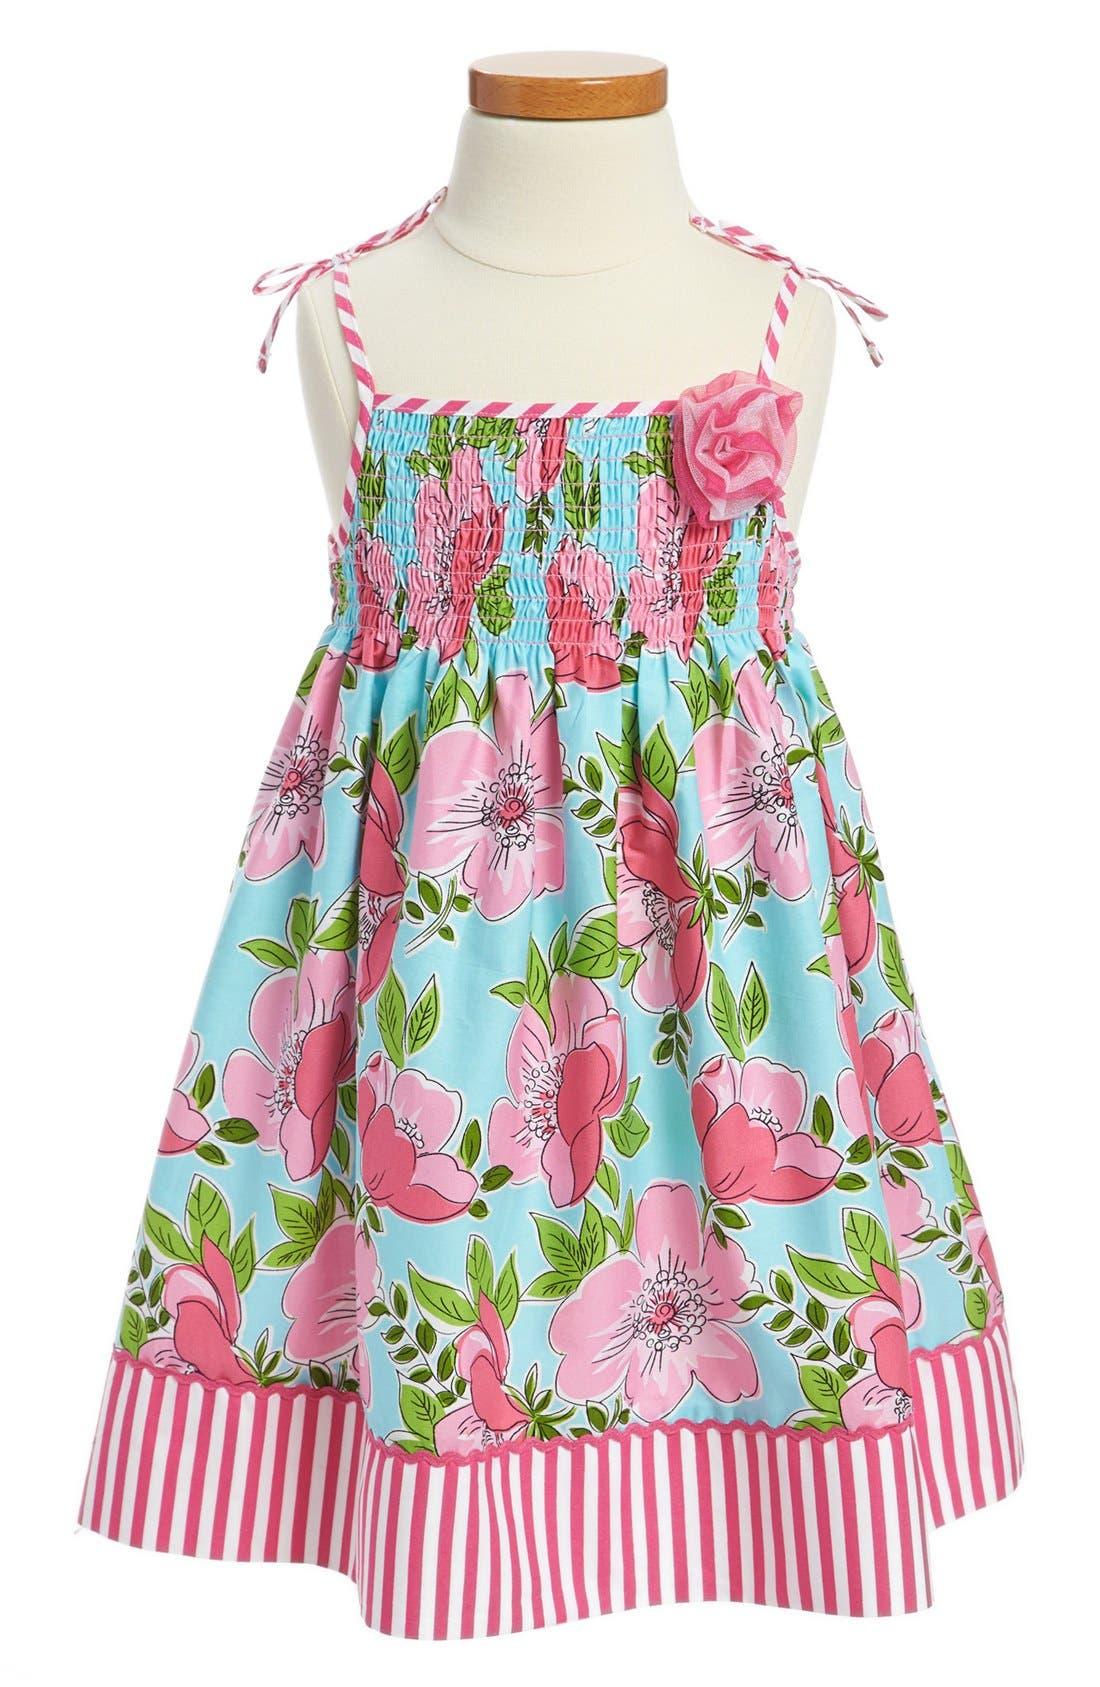 Alternate Image 1 Selected - Marmelatta Floral Dress (Toddler Girls)